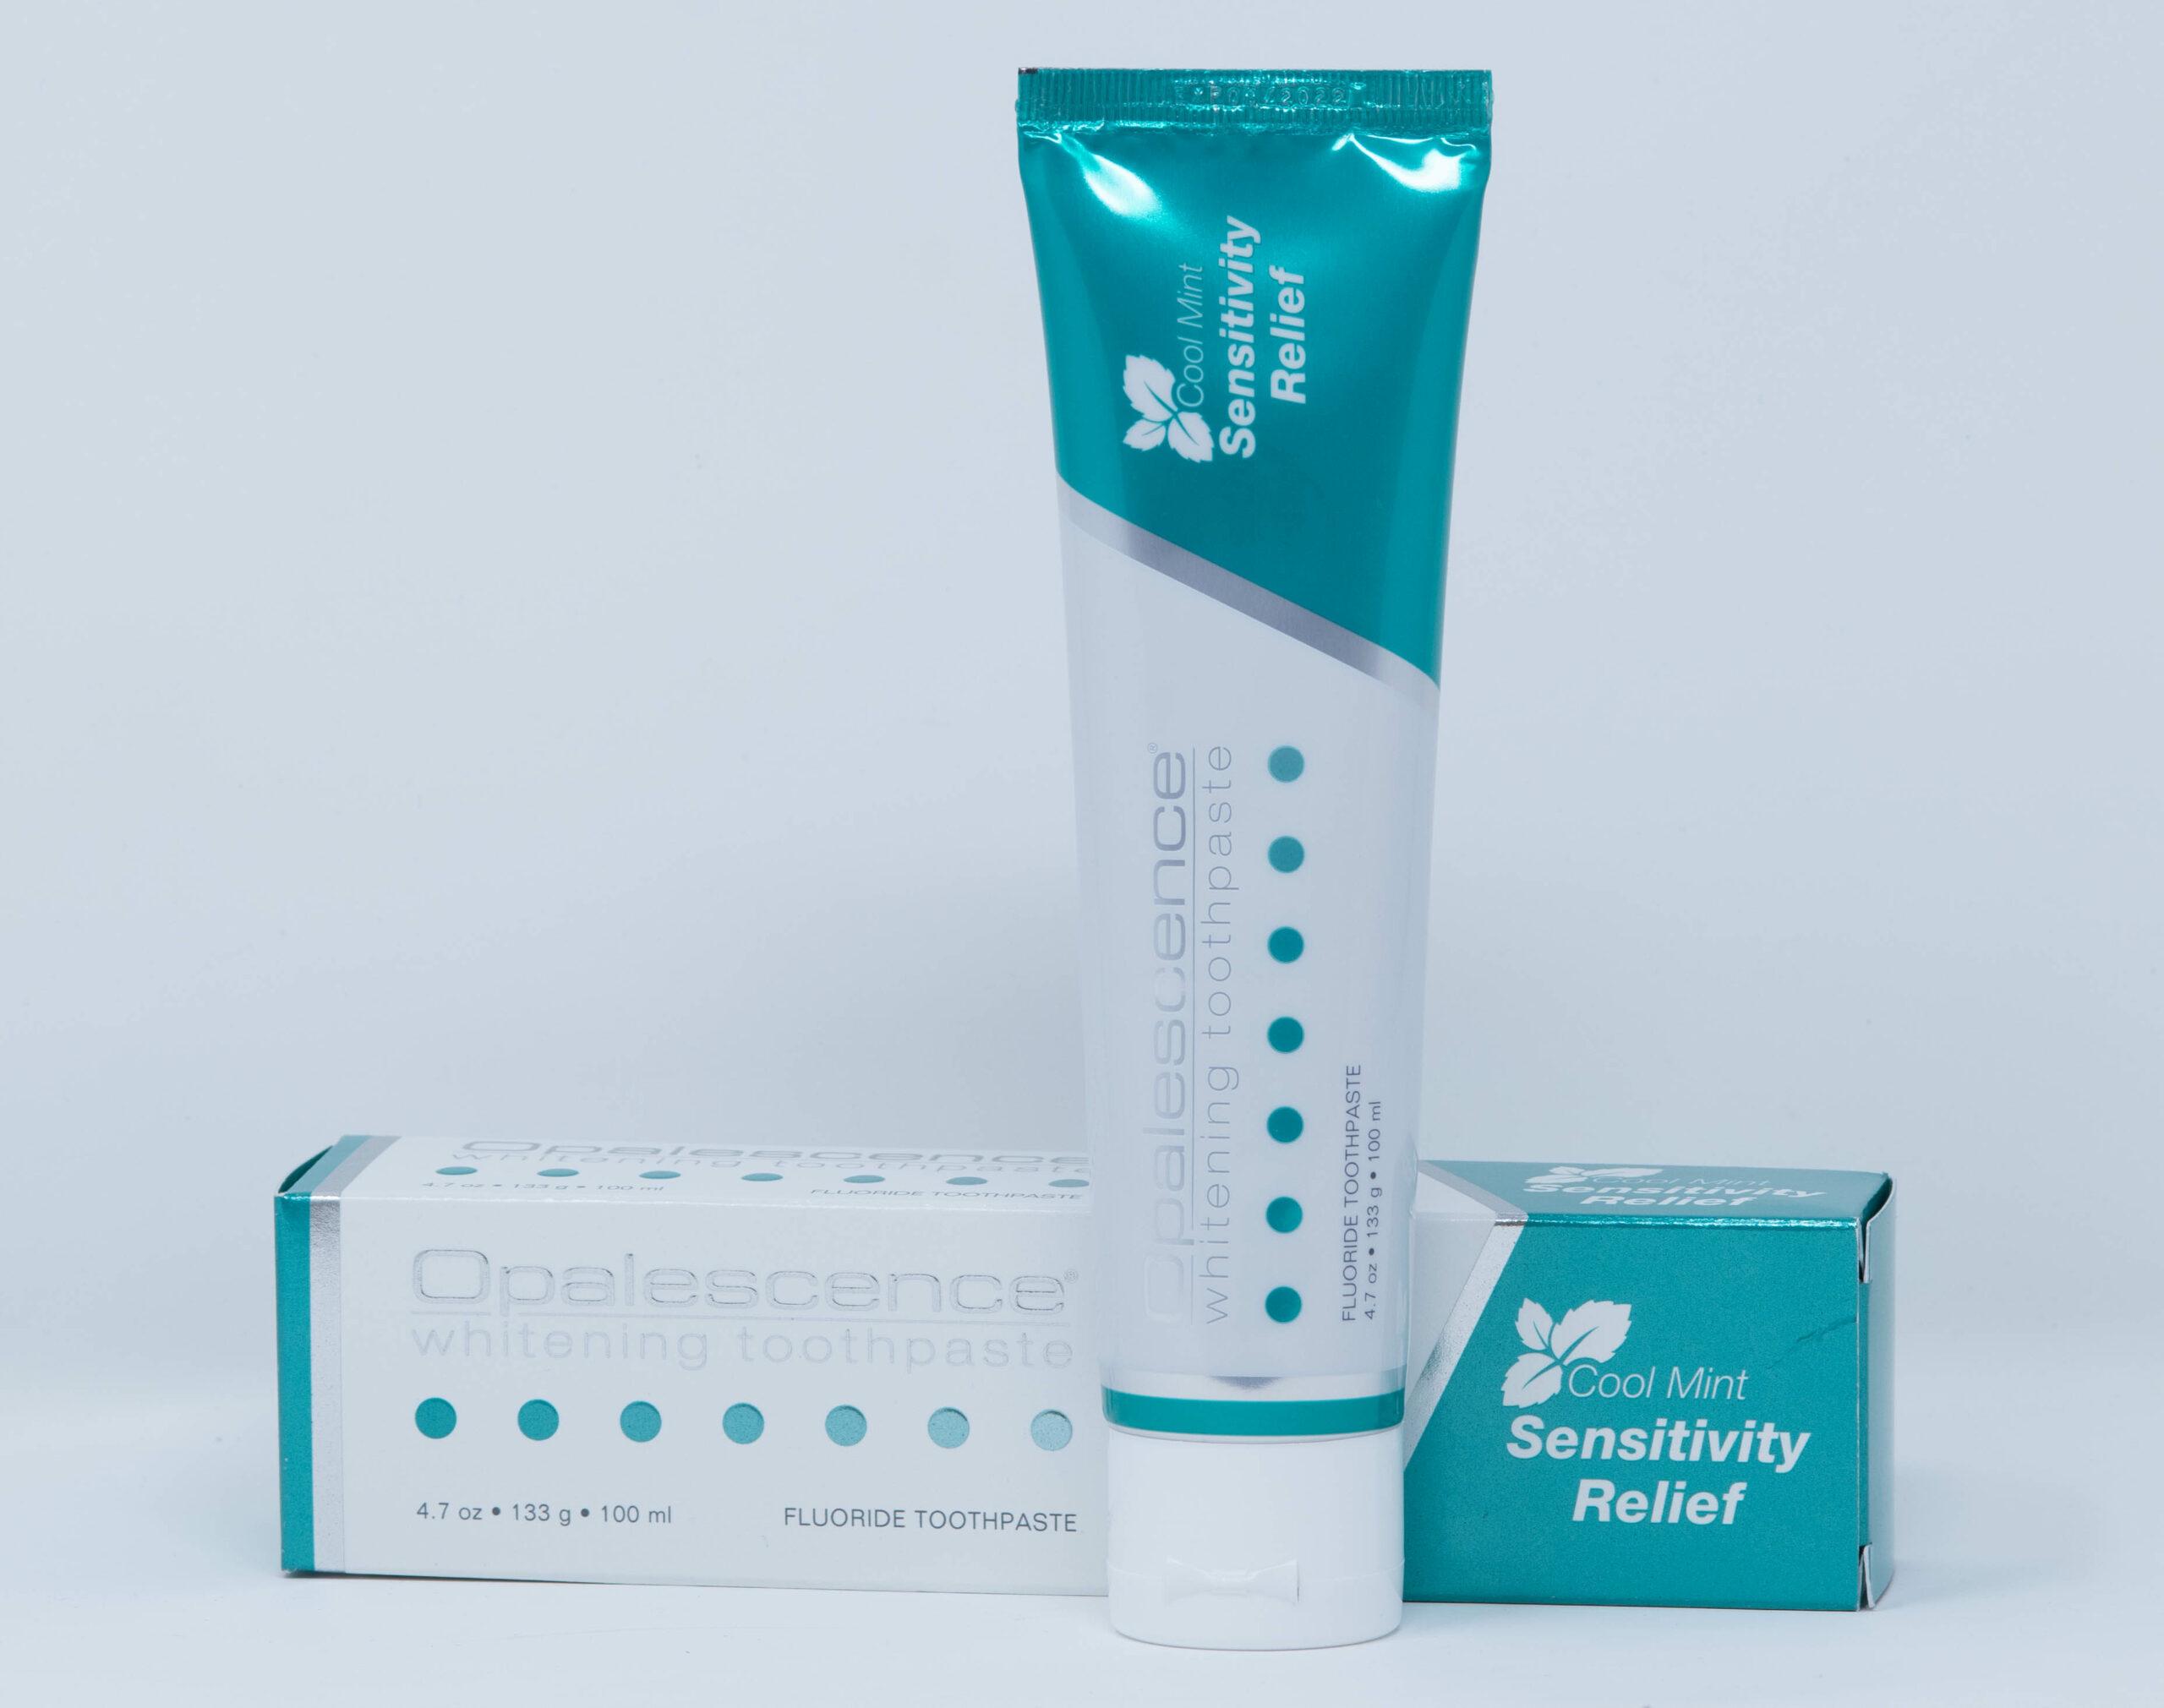 Ultradent Dentifricio Opalescence Whitening Sensitivity Relief - 100 ml